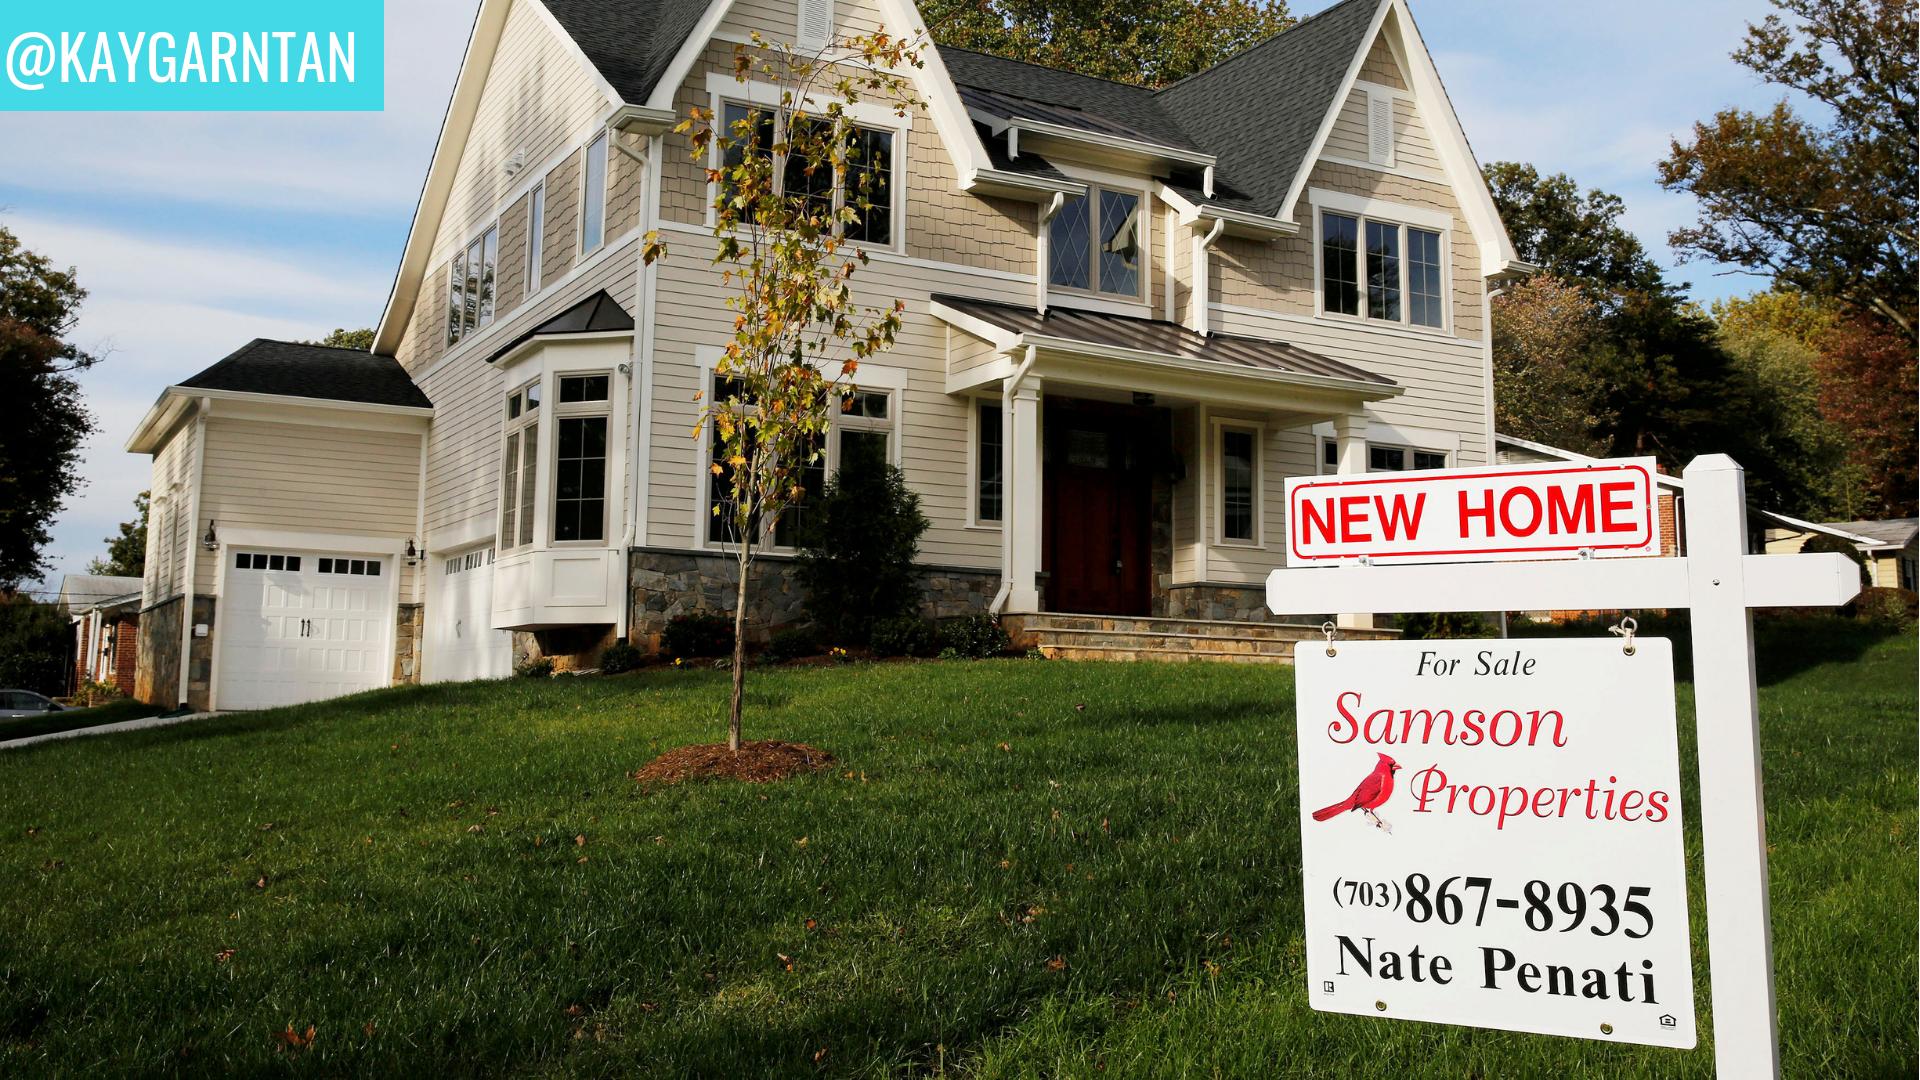 Should You Buy A Property